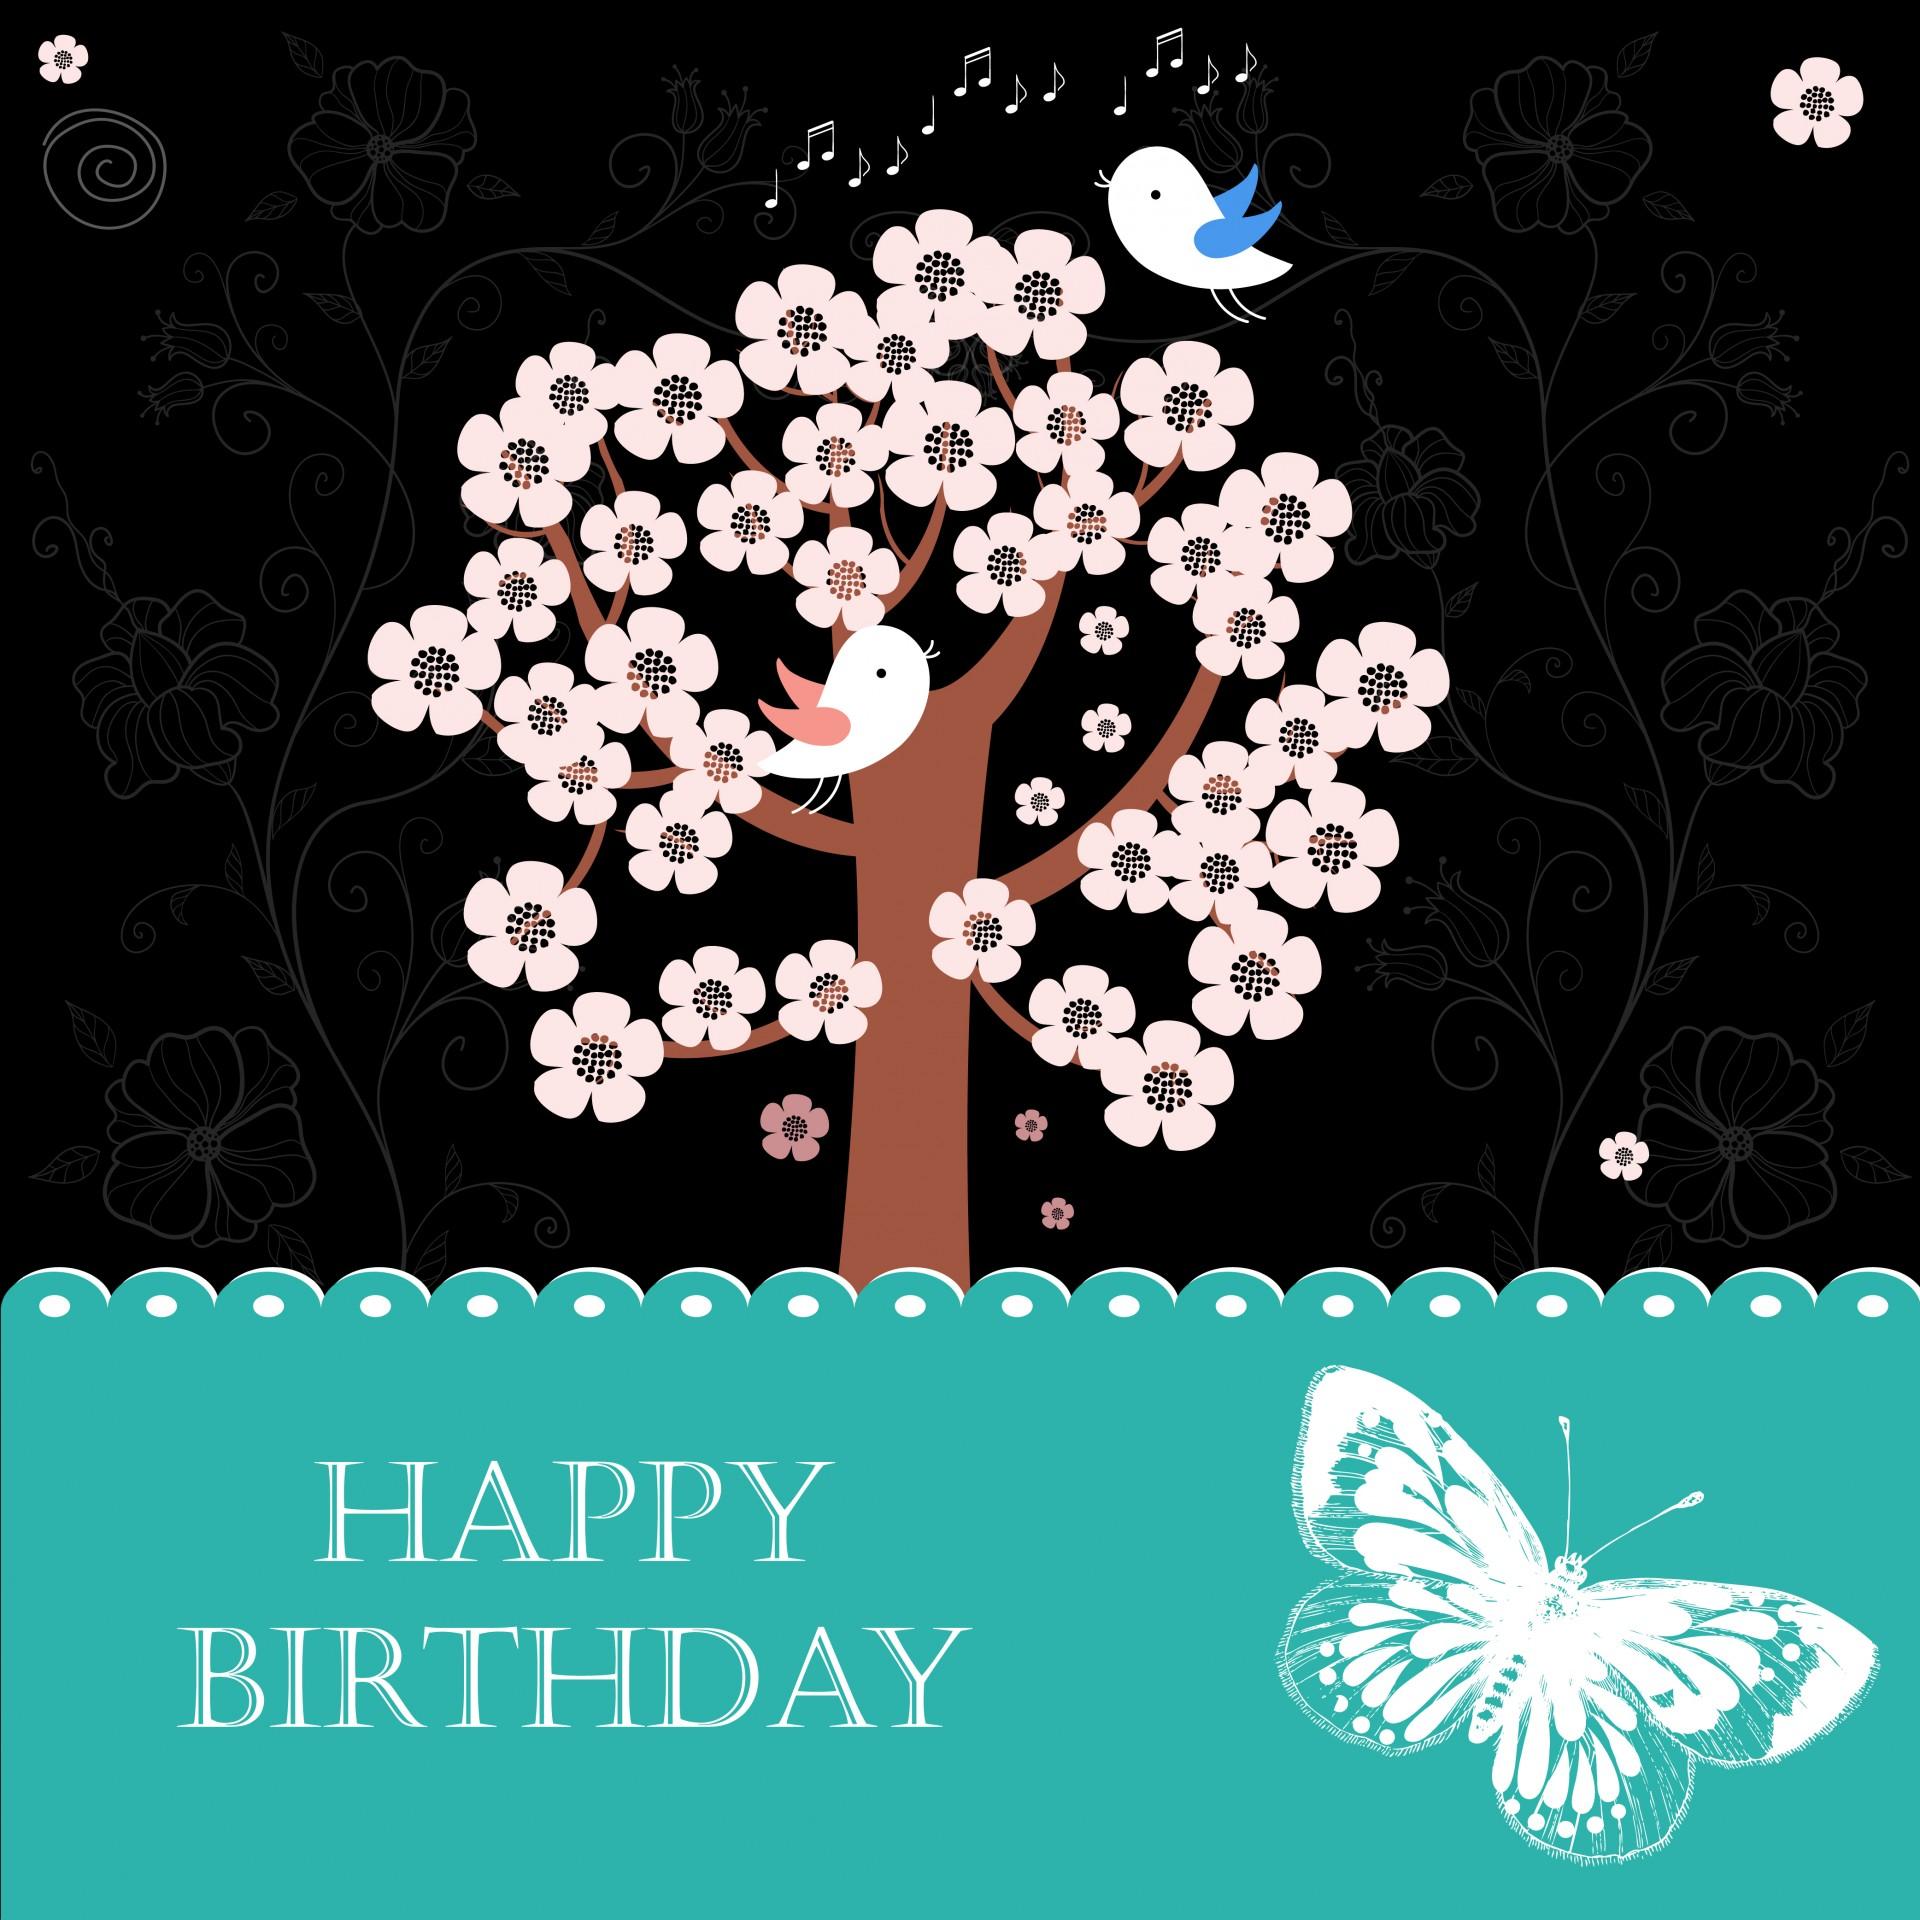 Birthdaynbspcardcardcuteflowersfloral Free Photo From